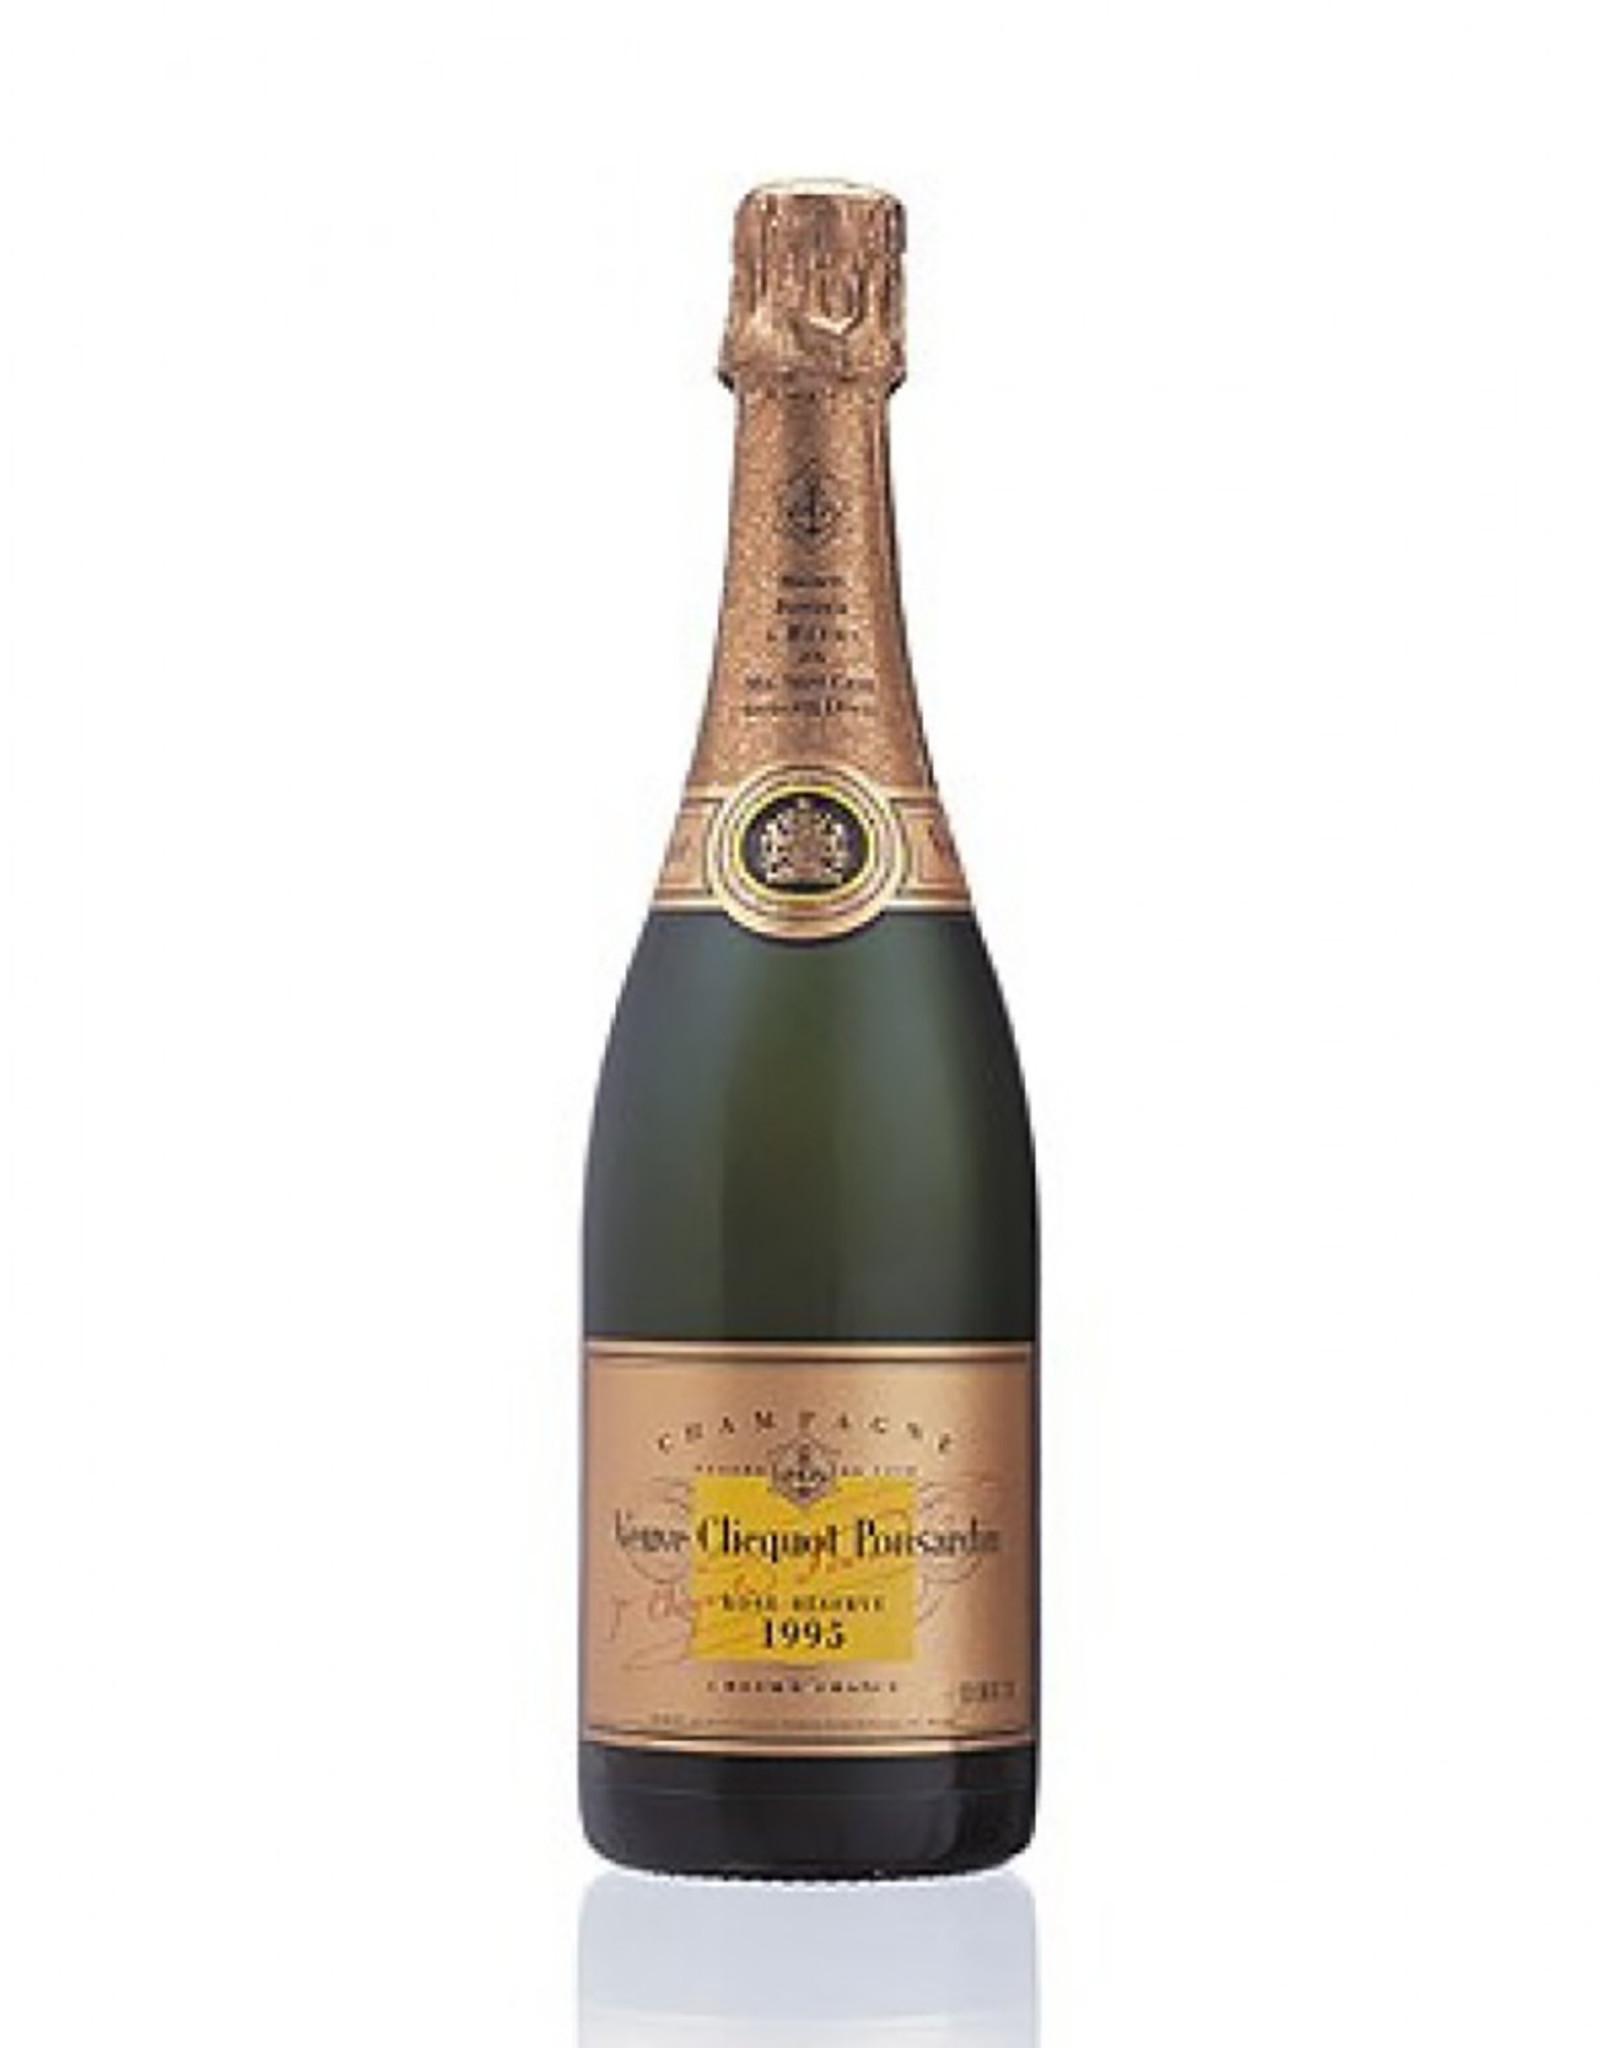 Veuve Clicquot Ponsardin Rosé Reserve 1998